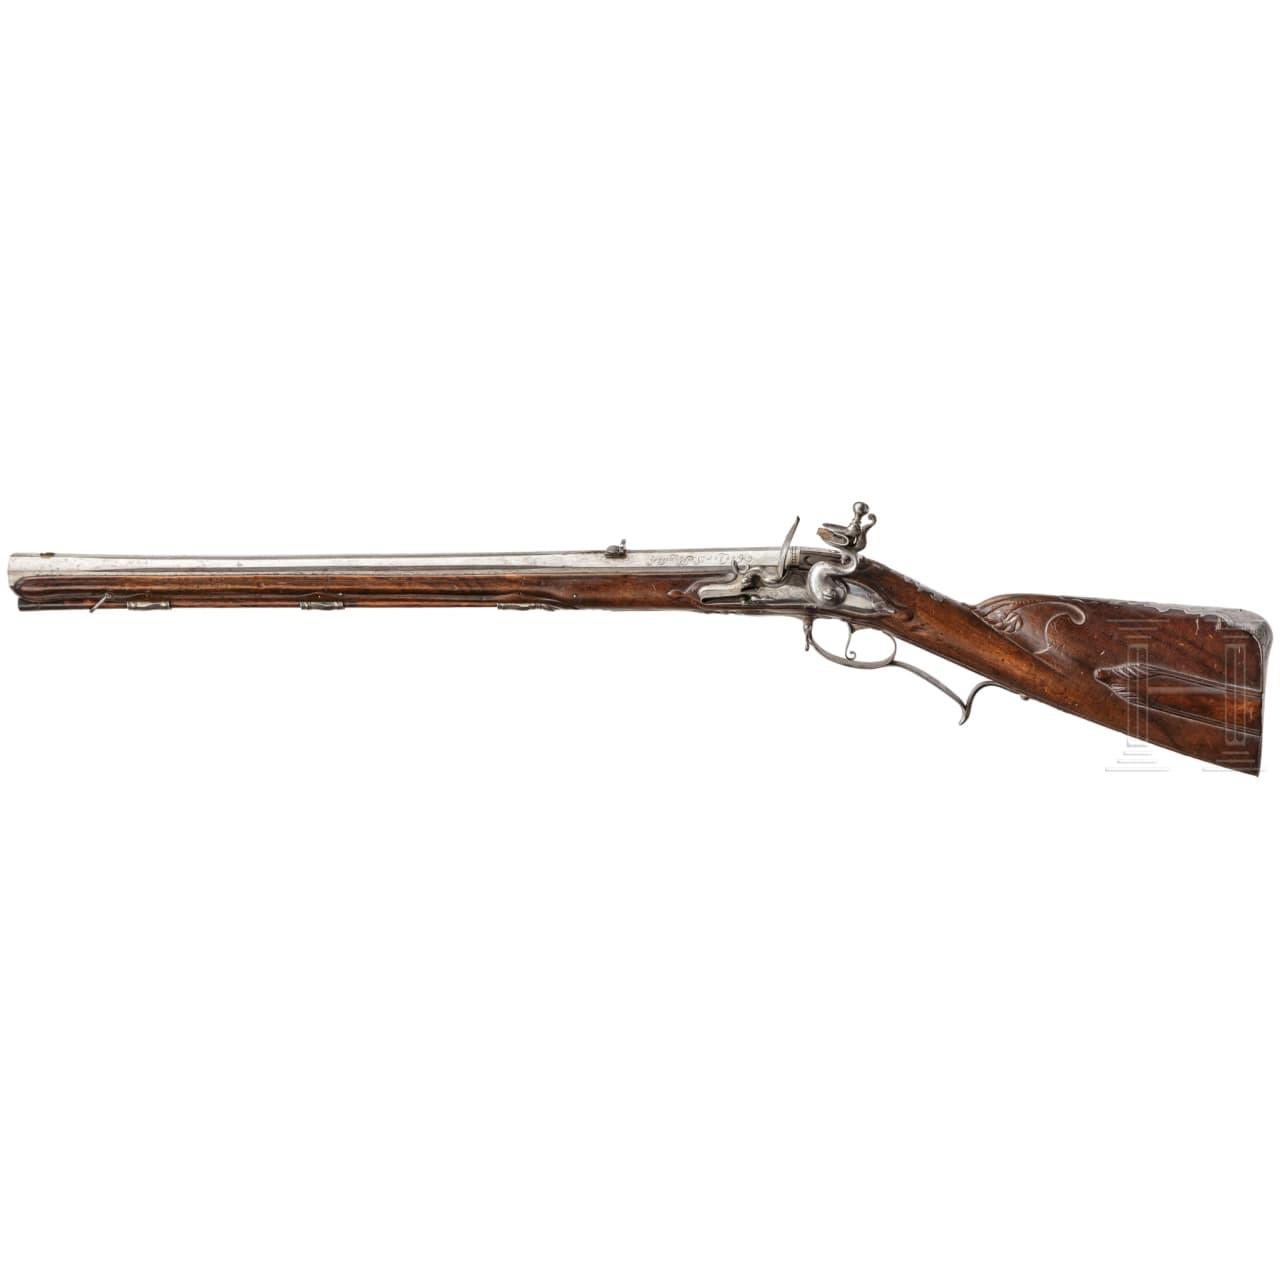 A flintlock carbine for a left-handed person, Caspar Kopstadt in Coesfeld, dated 1713